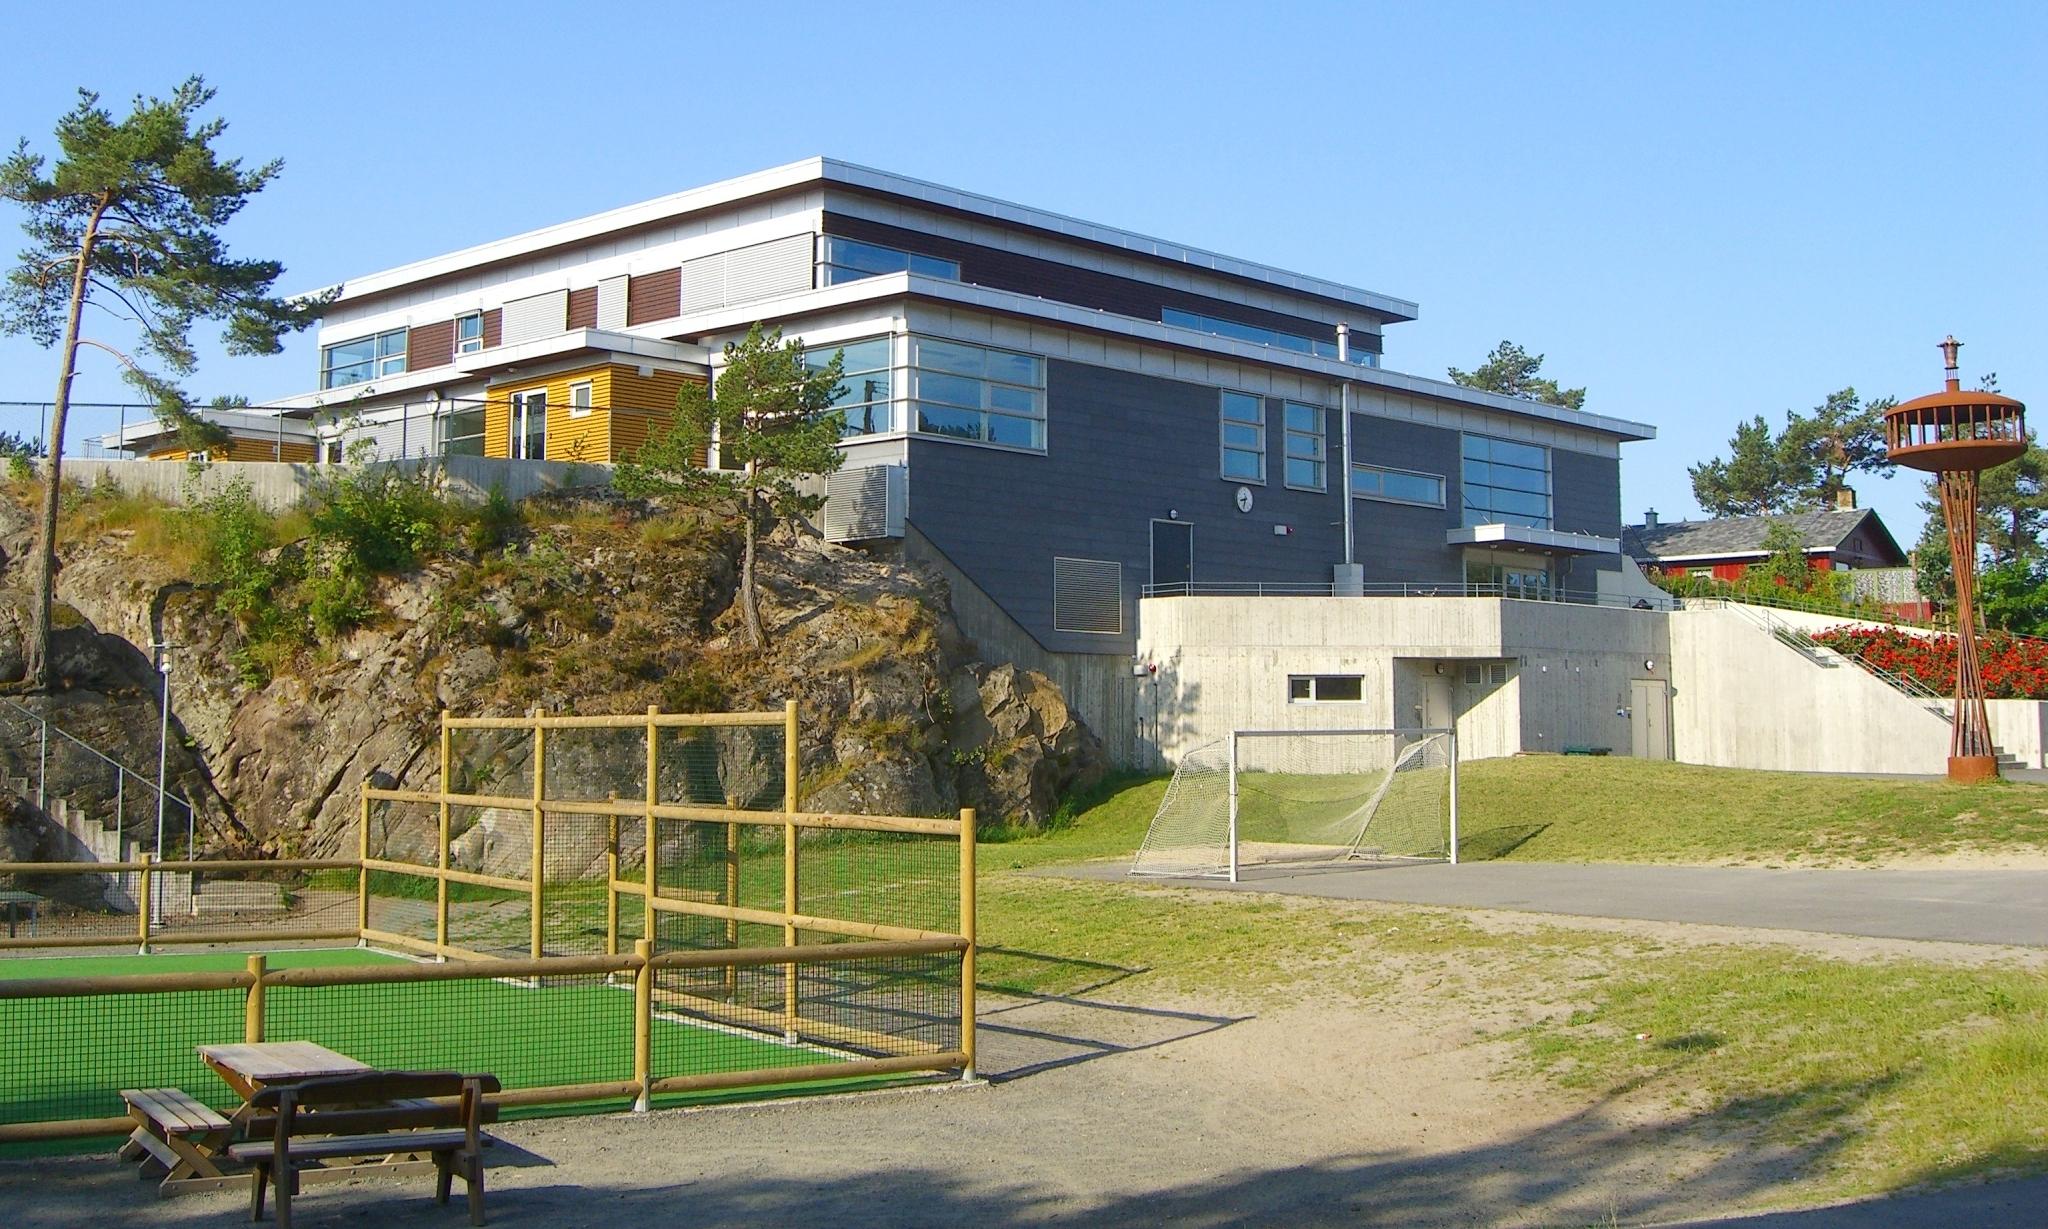 Skolen omfattet også ca 4000 m2 parkeringsanlegg og utomhusarealer.